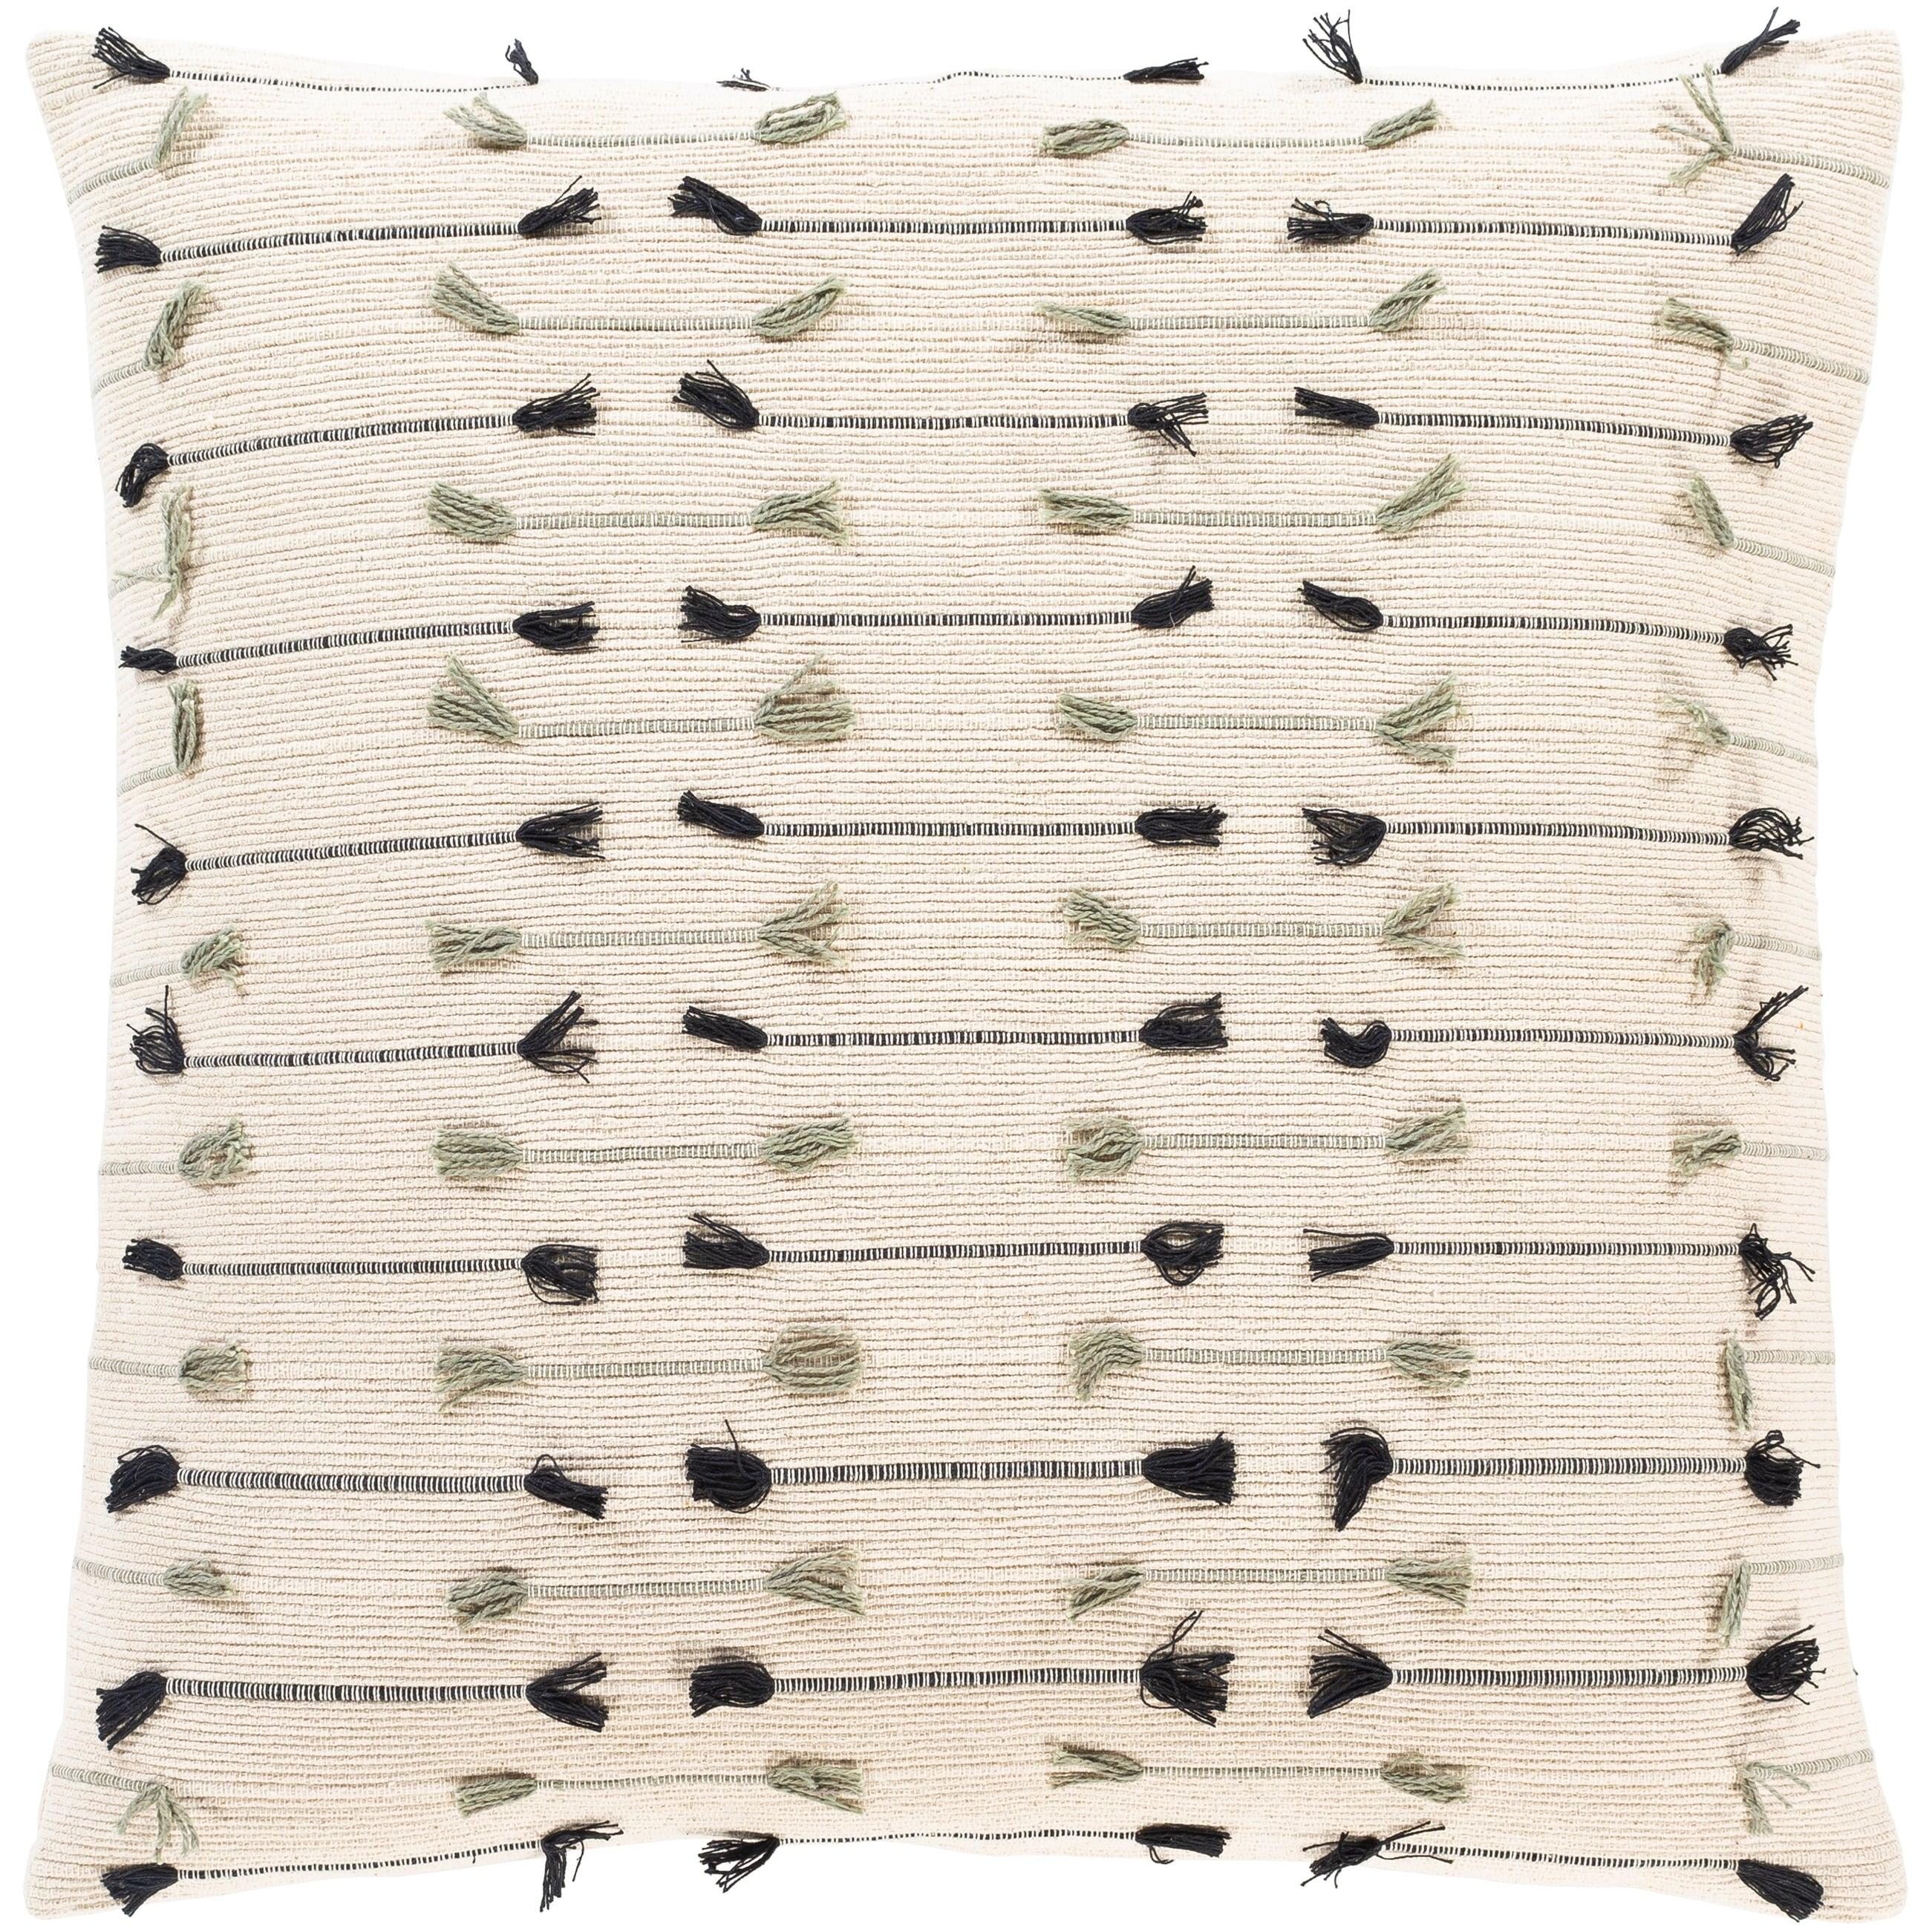 21 x 13 FREE SHIPPING Zipper Closure Down Insert Included FREE Returns. Linen Trim Accent Lumbar Pillow